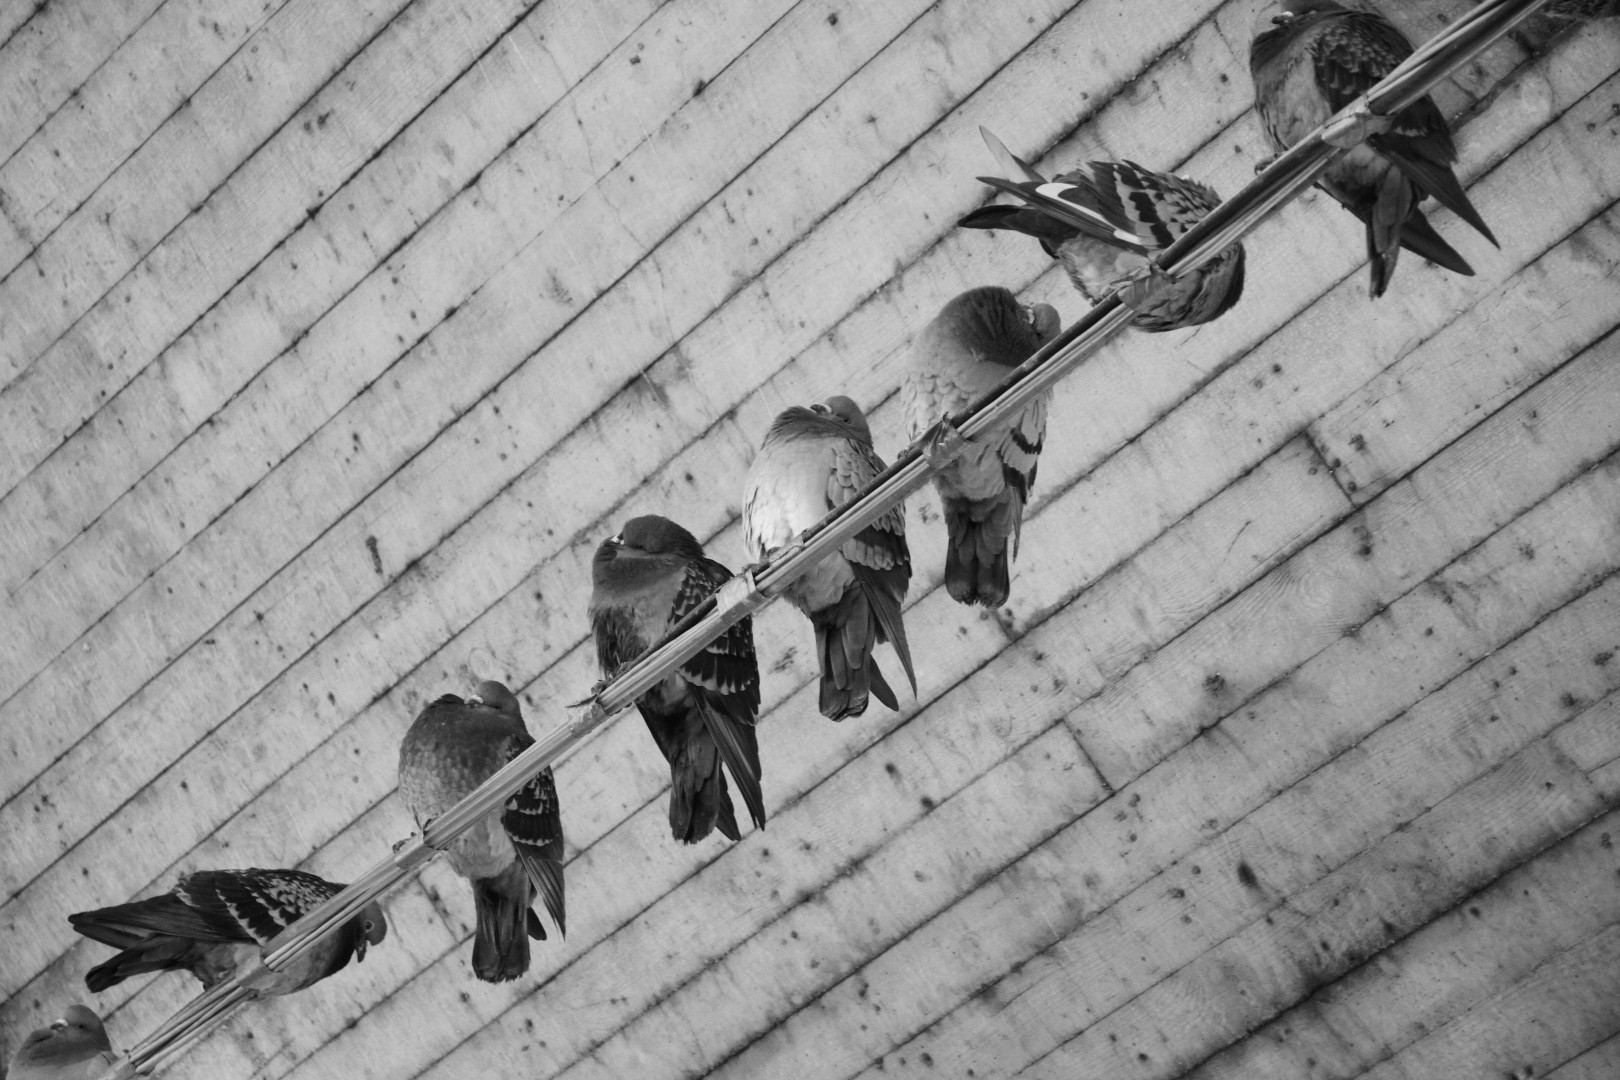 schräge vögel